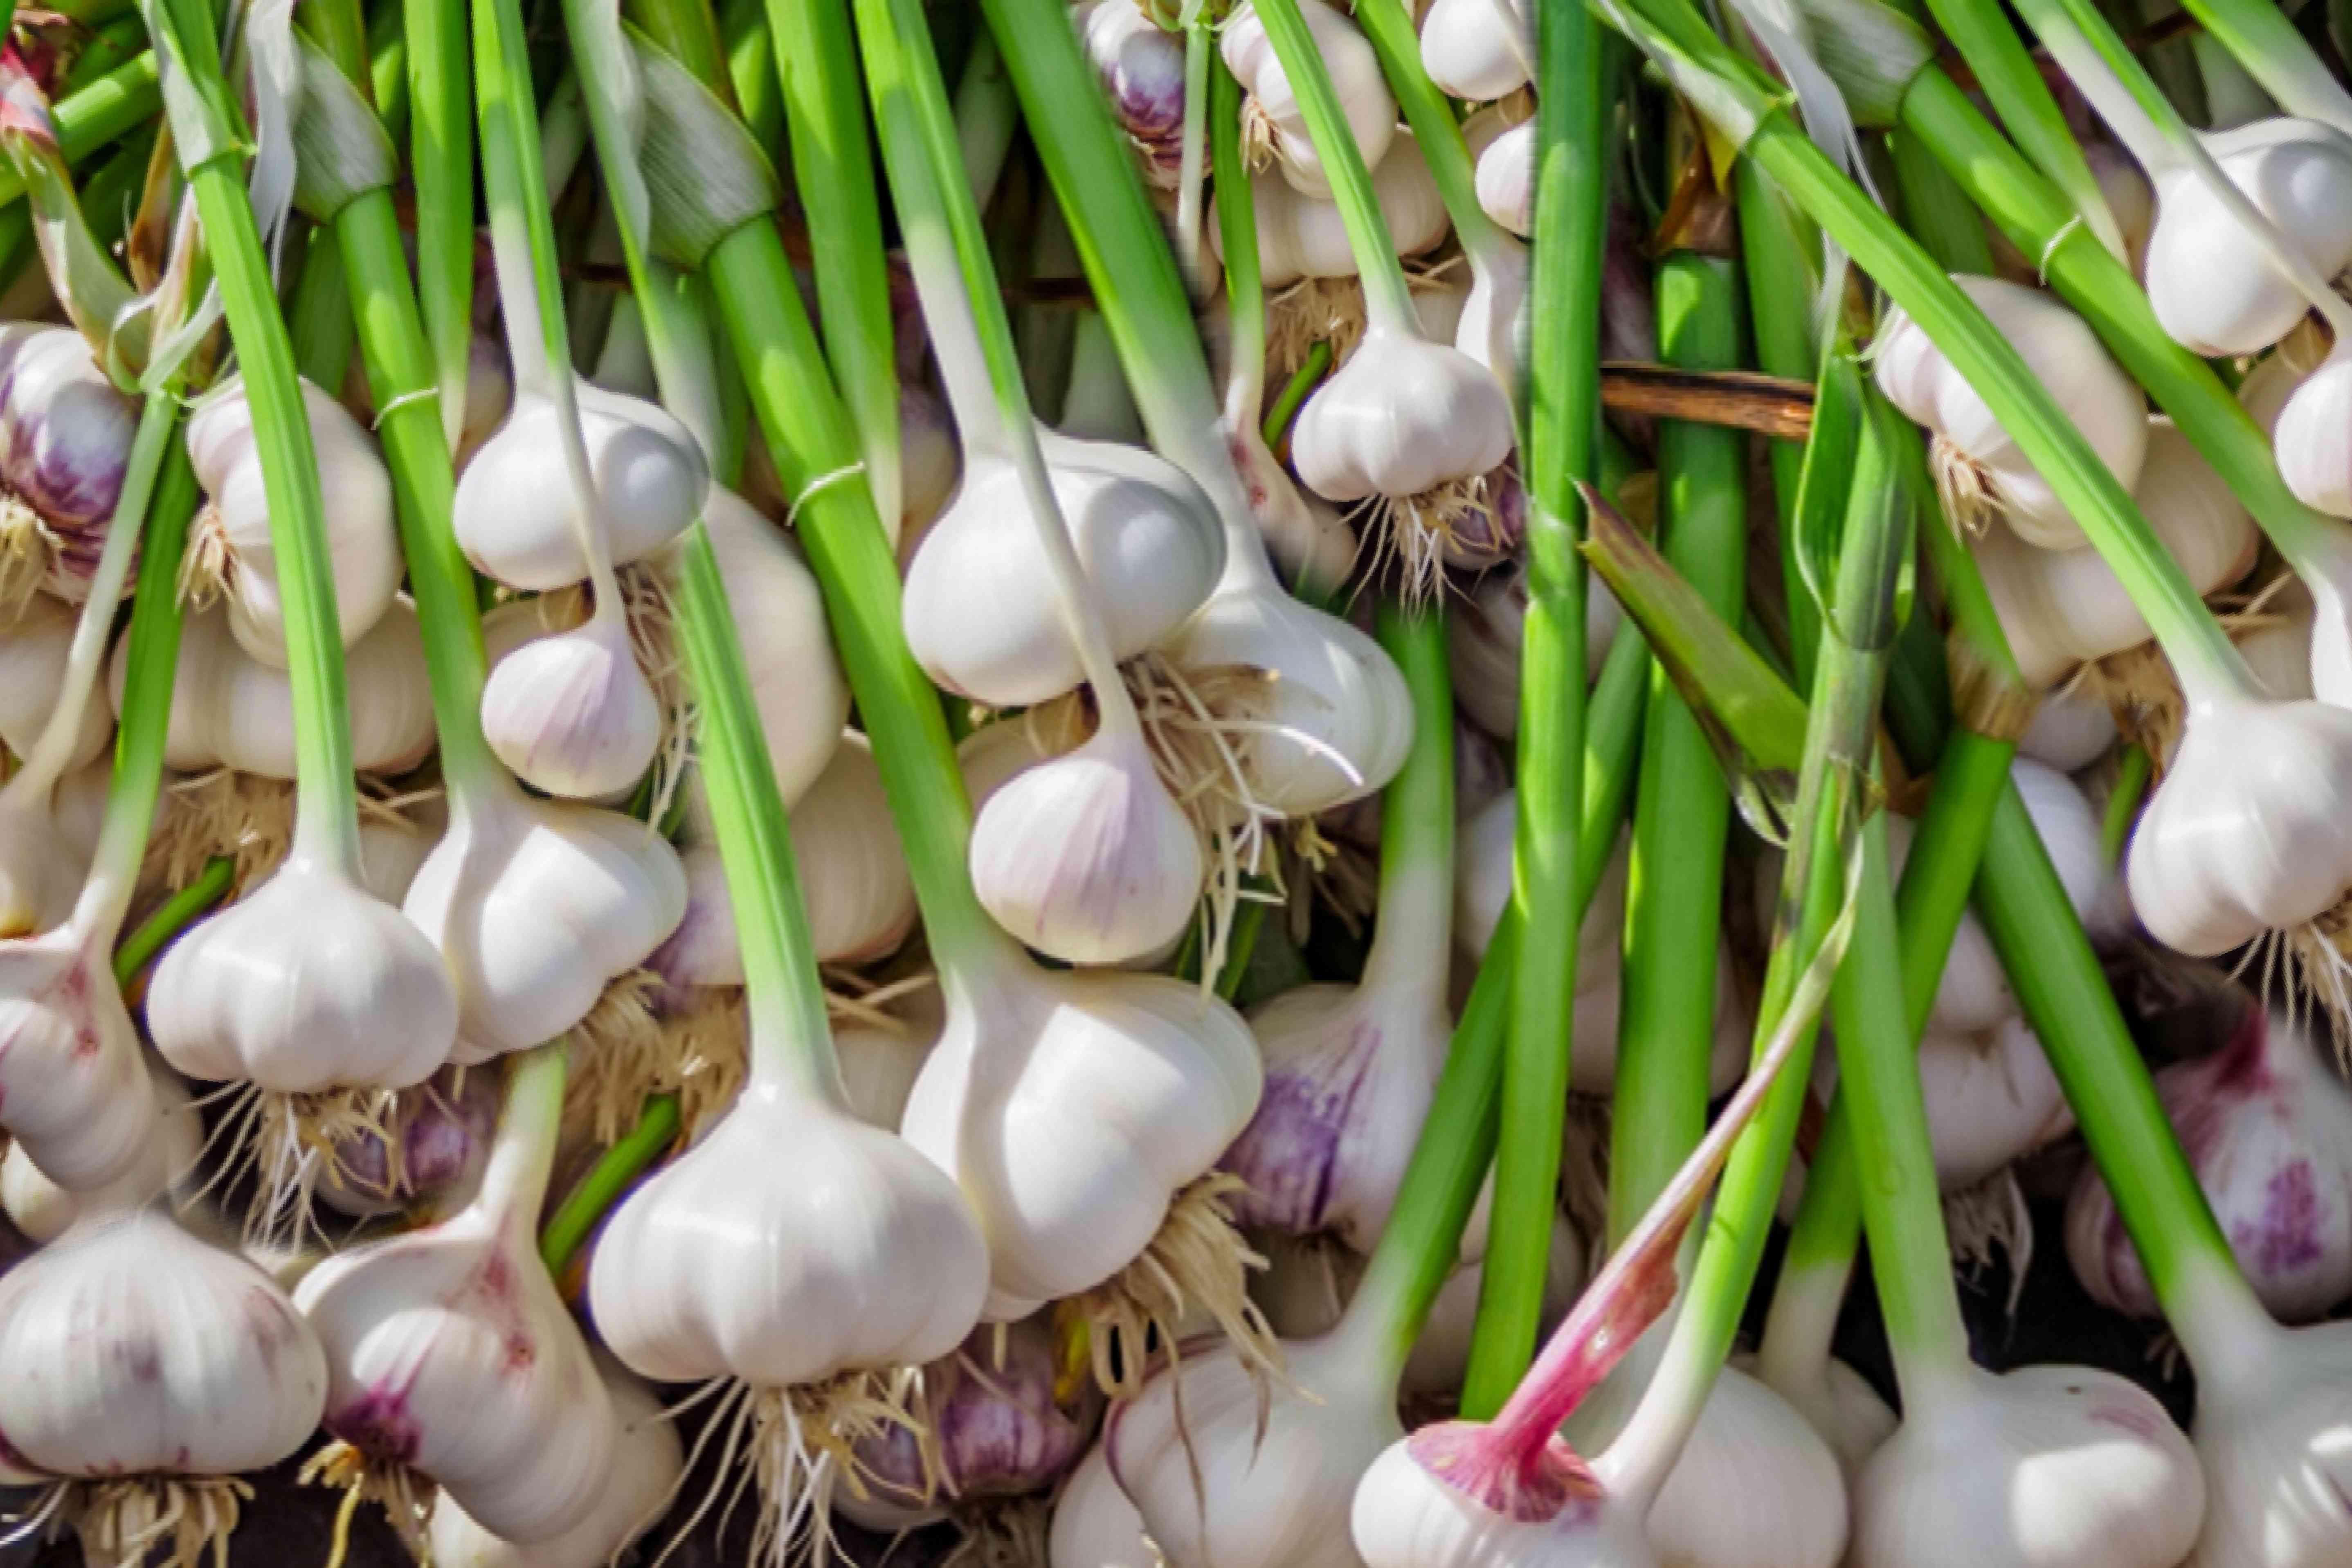 hardneck garlic harvest